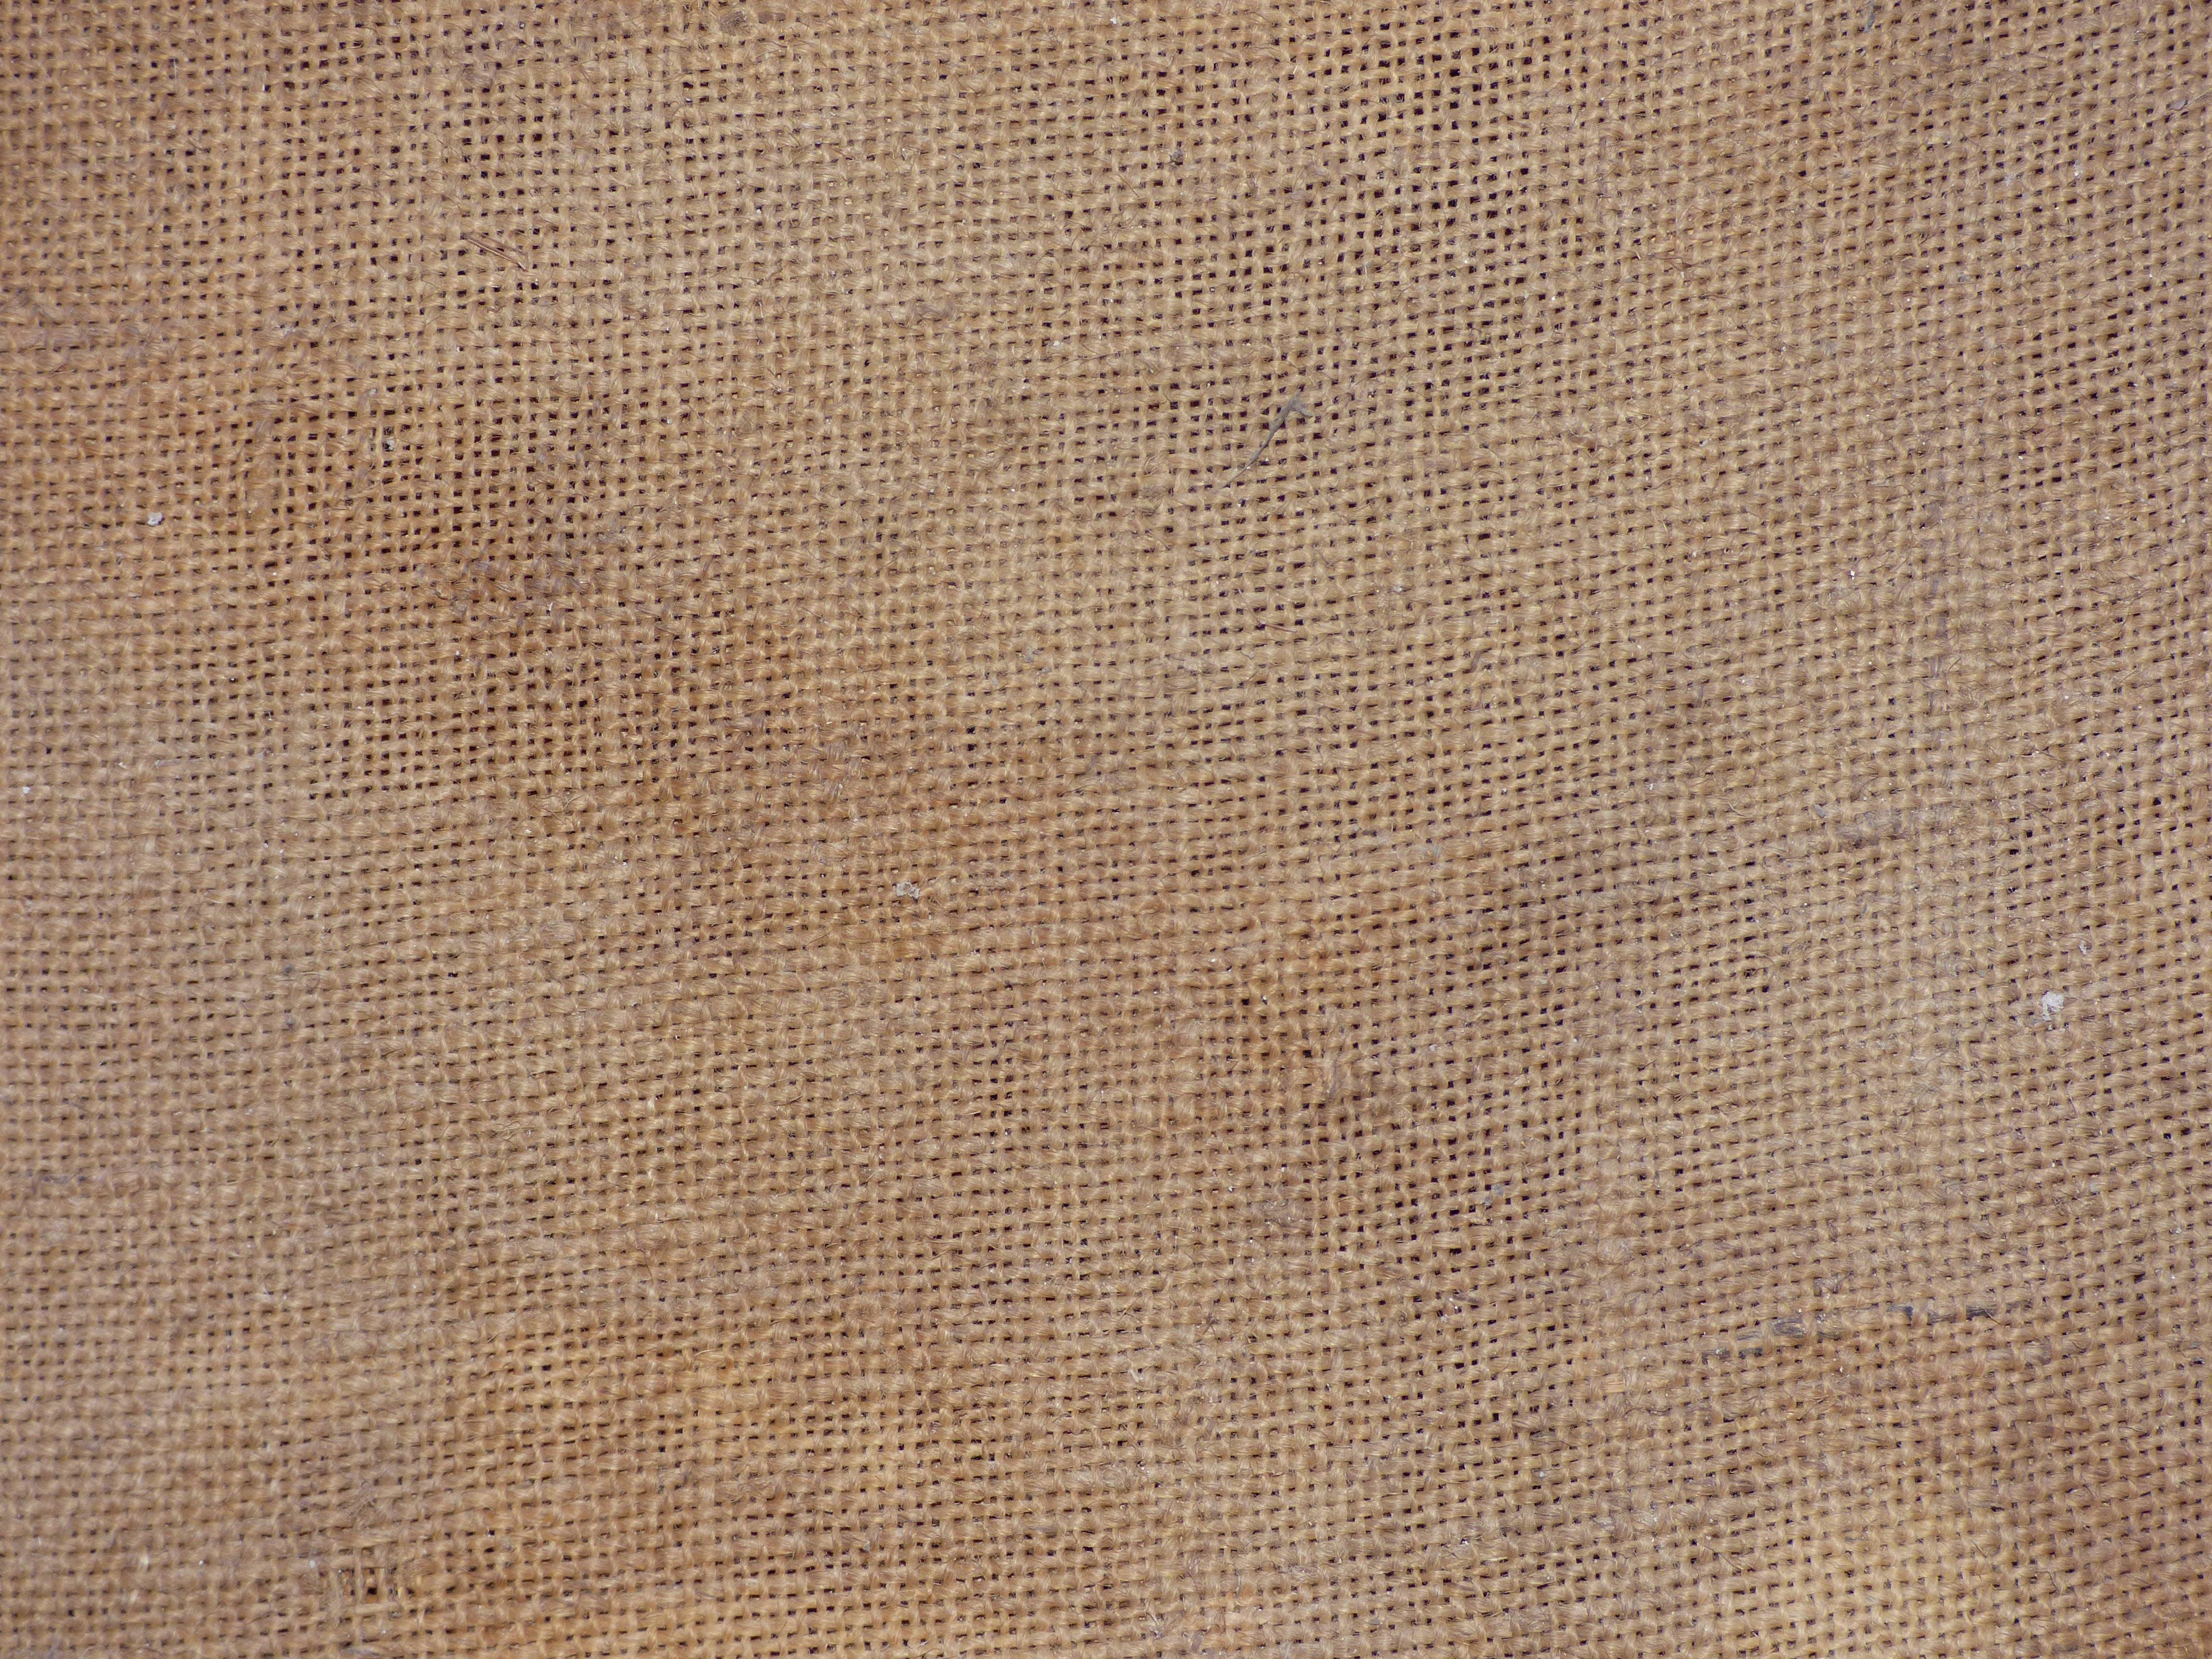 Free stock photo of texture, background, sack, burlap